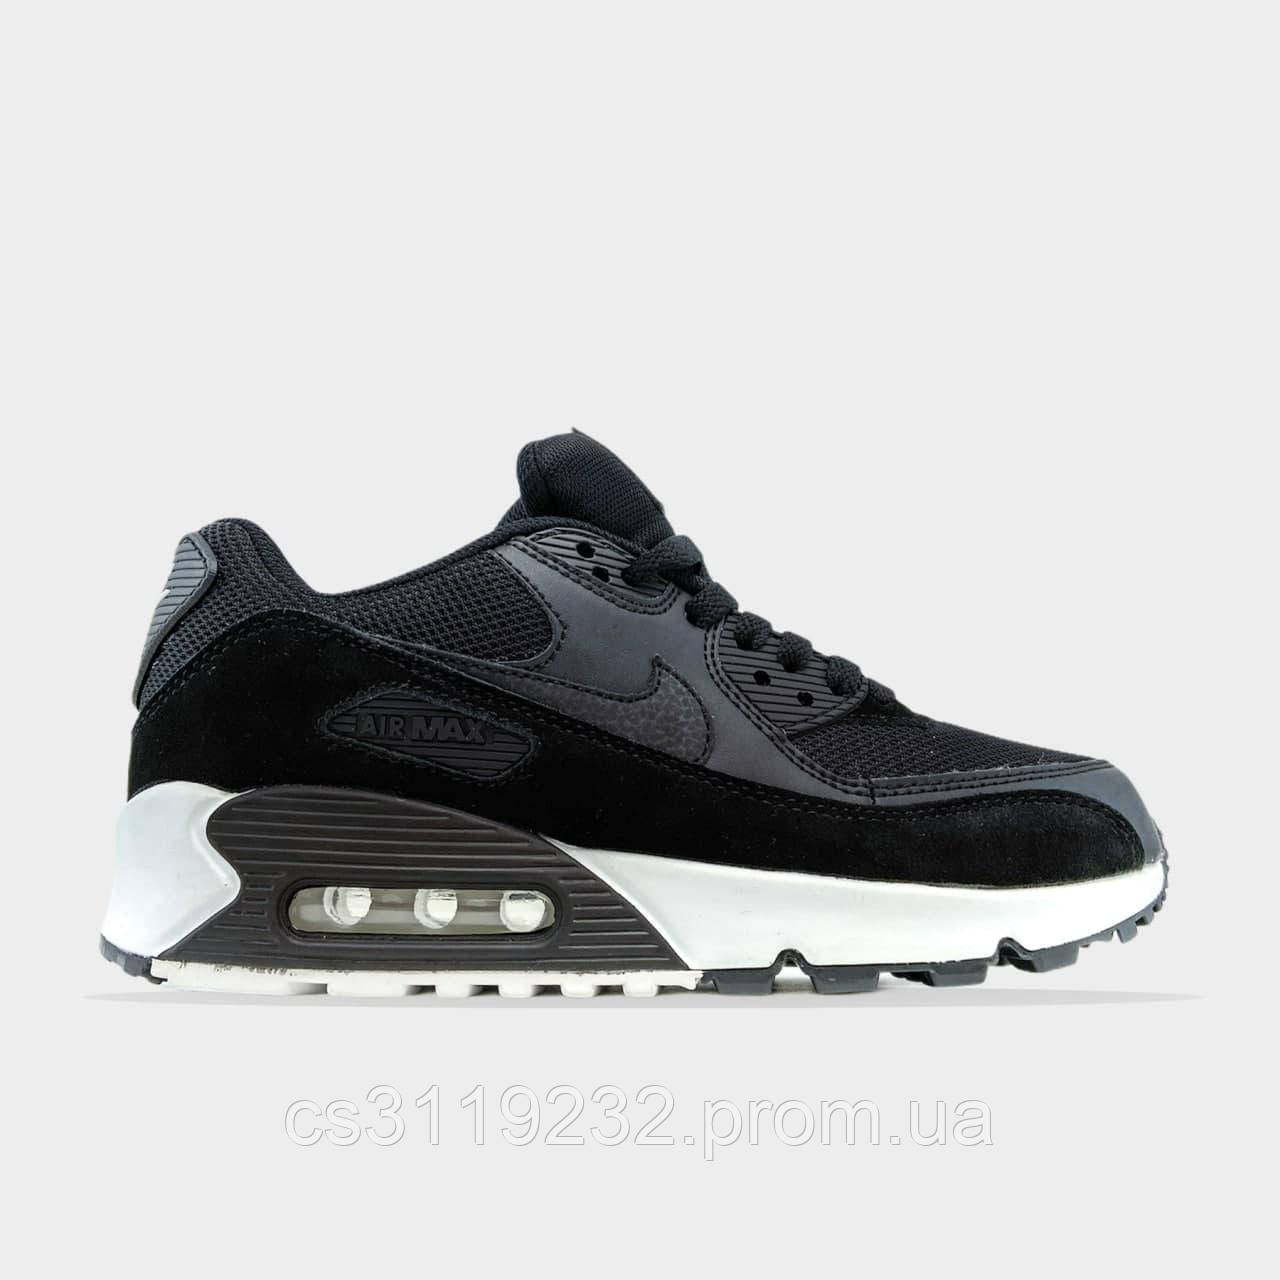 Женские кроссовки 90 Black White (белый)